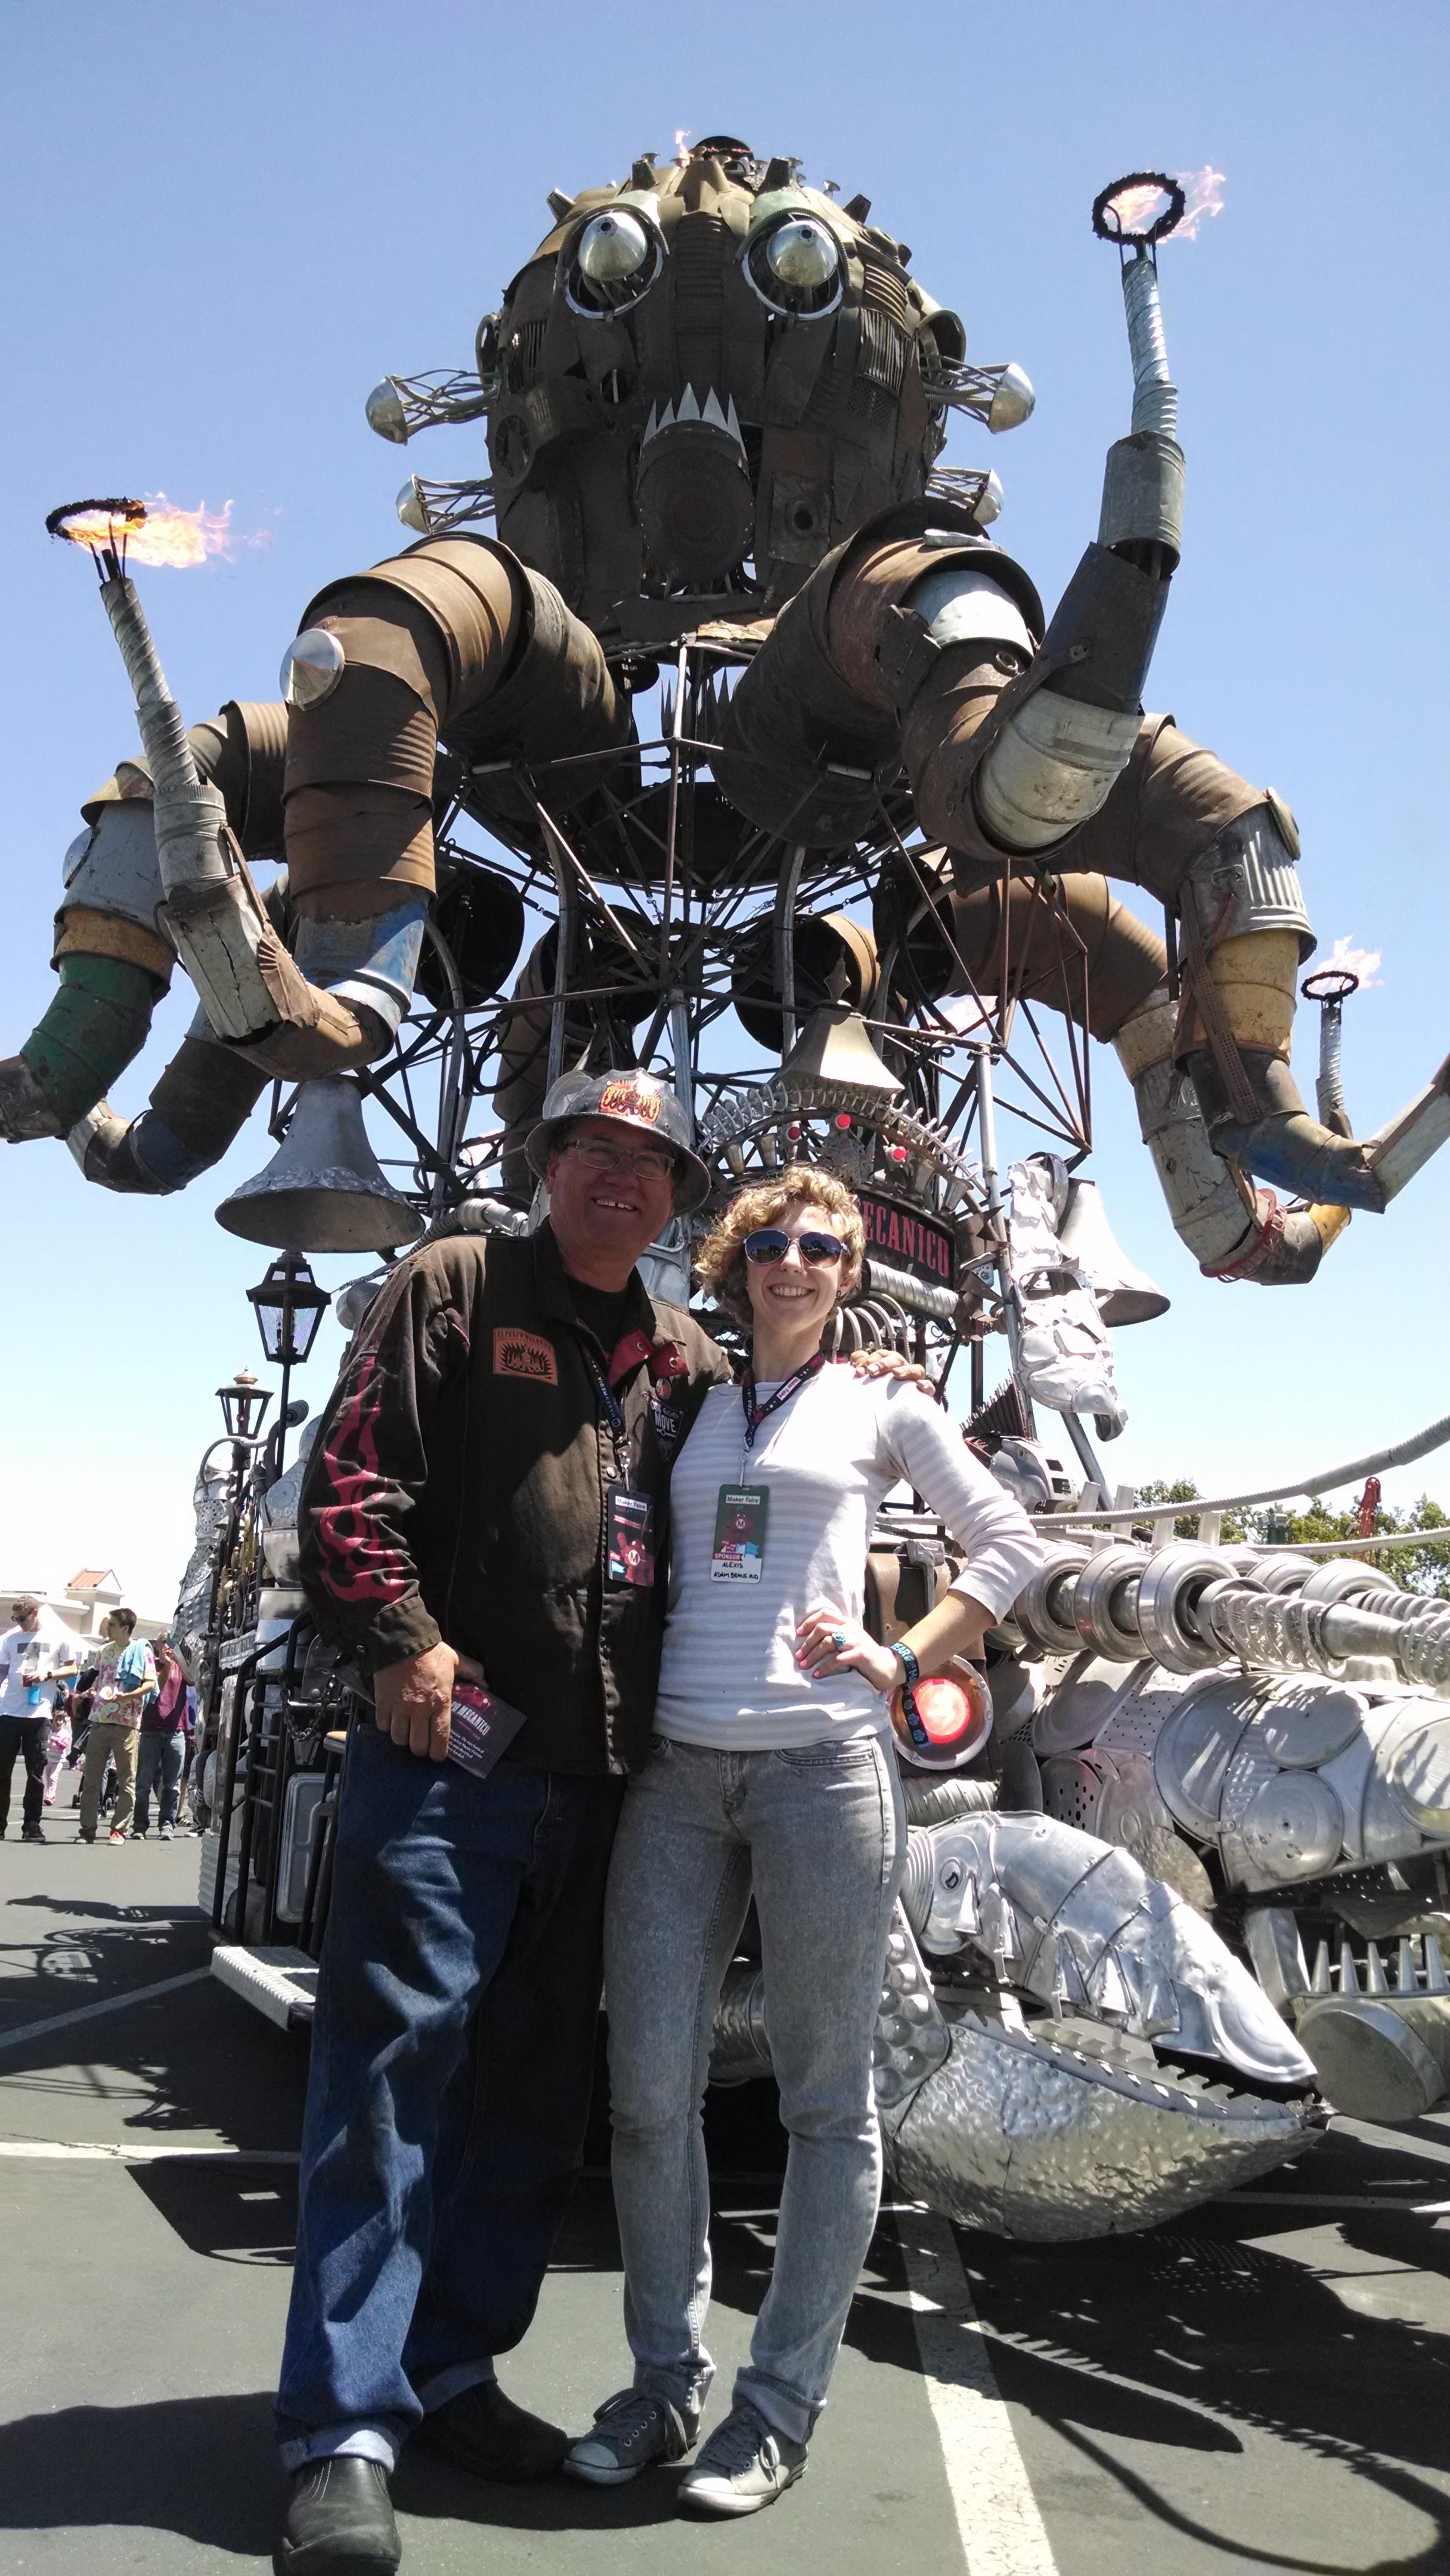 Alexis with Duane Flatmo, one of the co-creators of El Pulpo Mechanico!